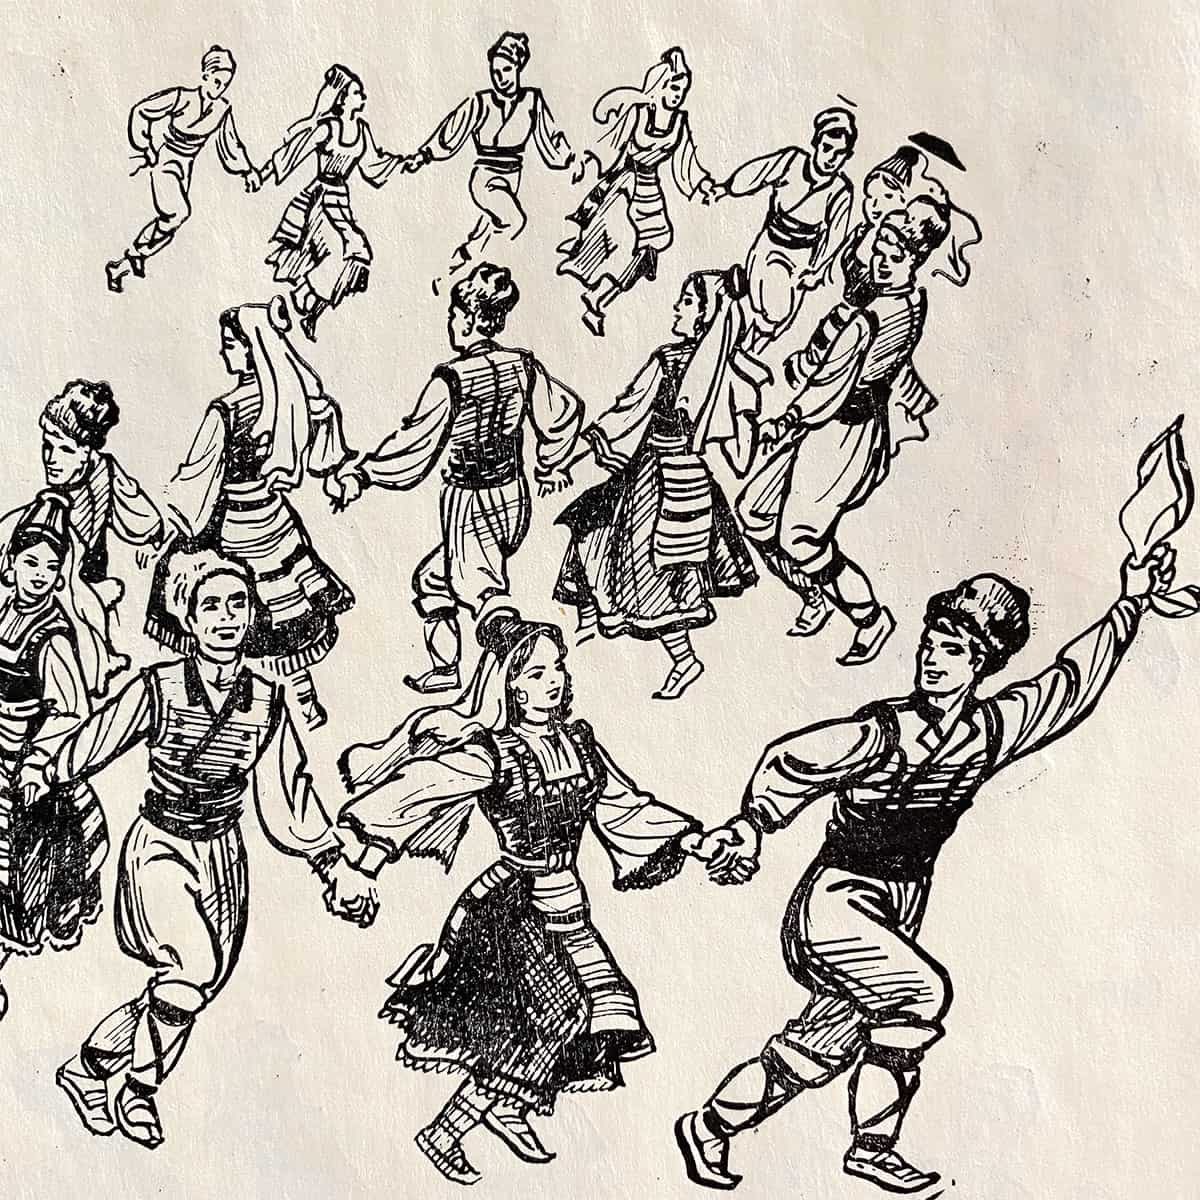 танцуване на Ганкино хоро - фигура 3